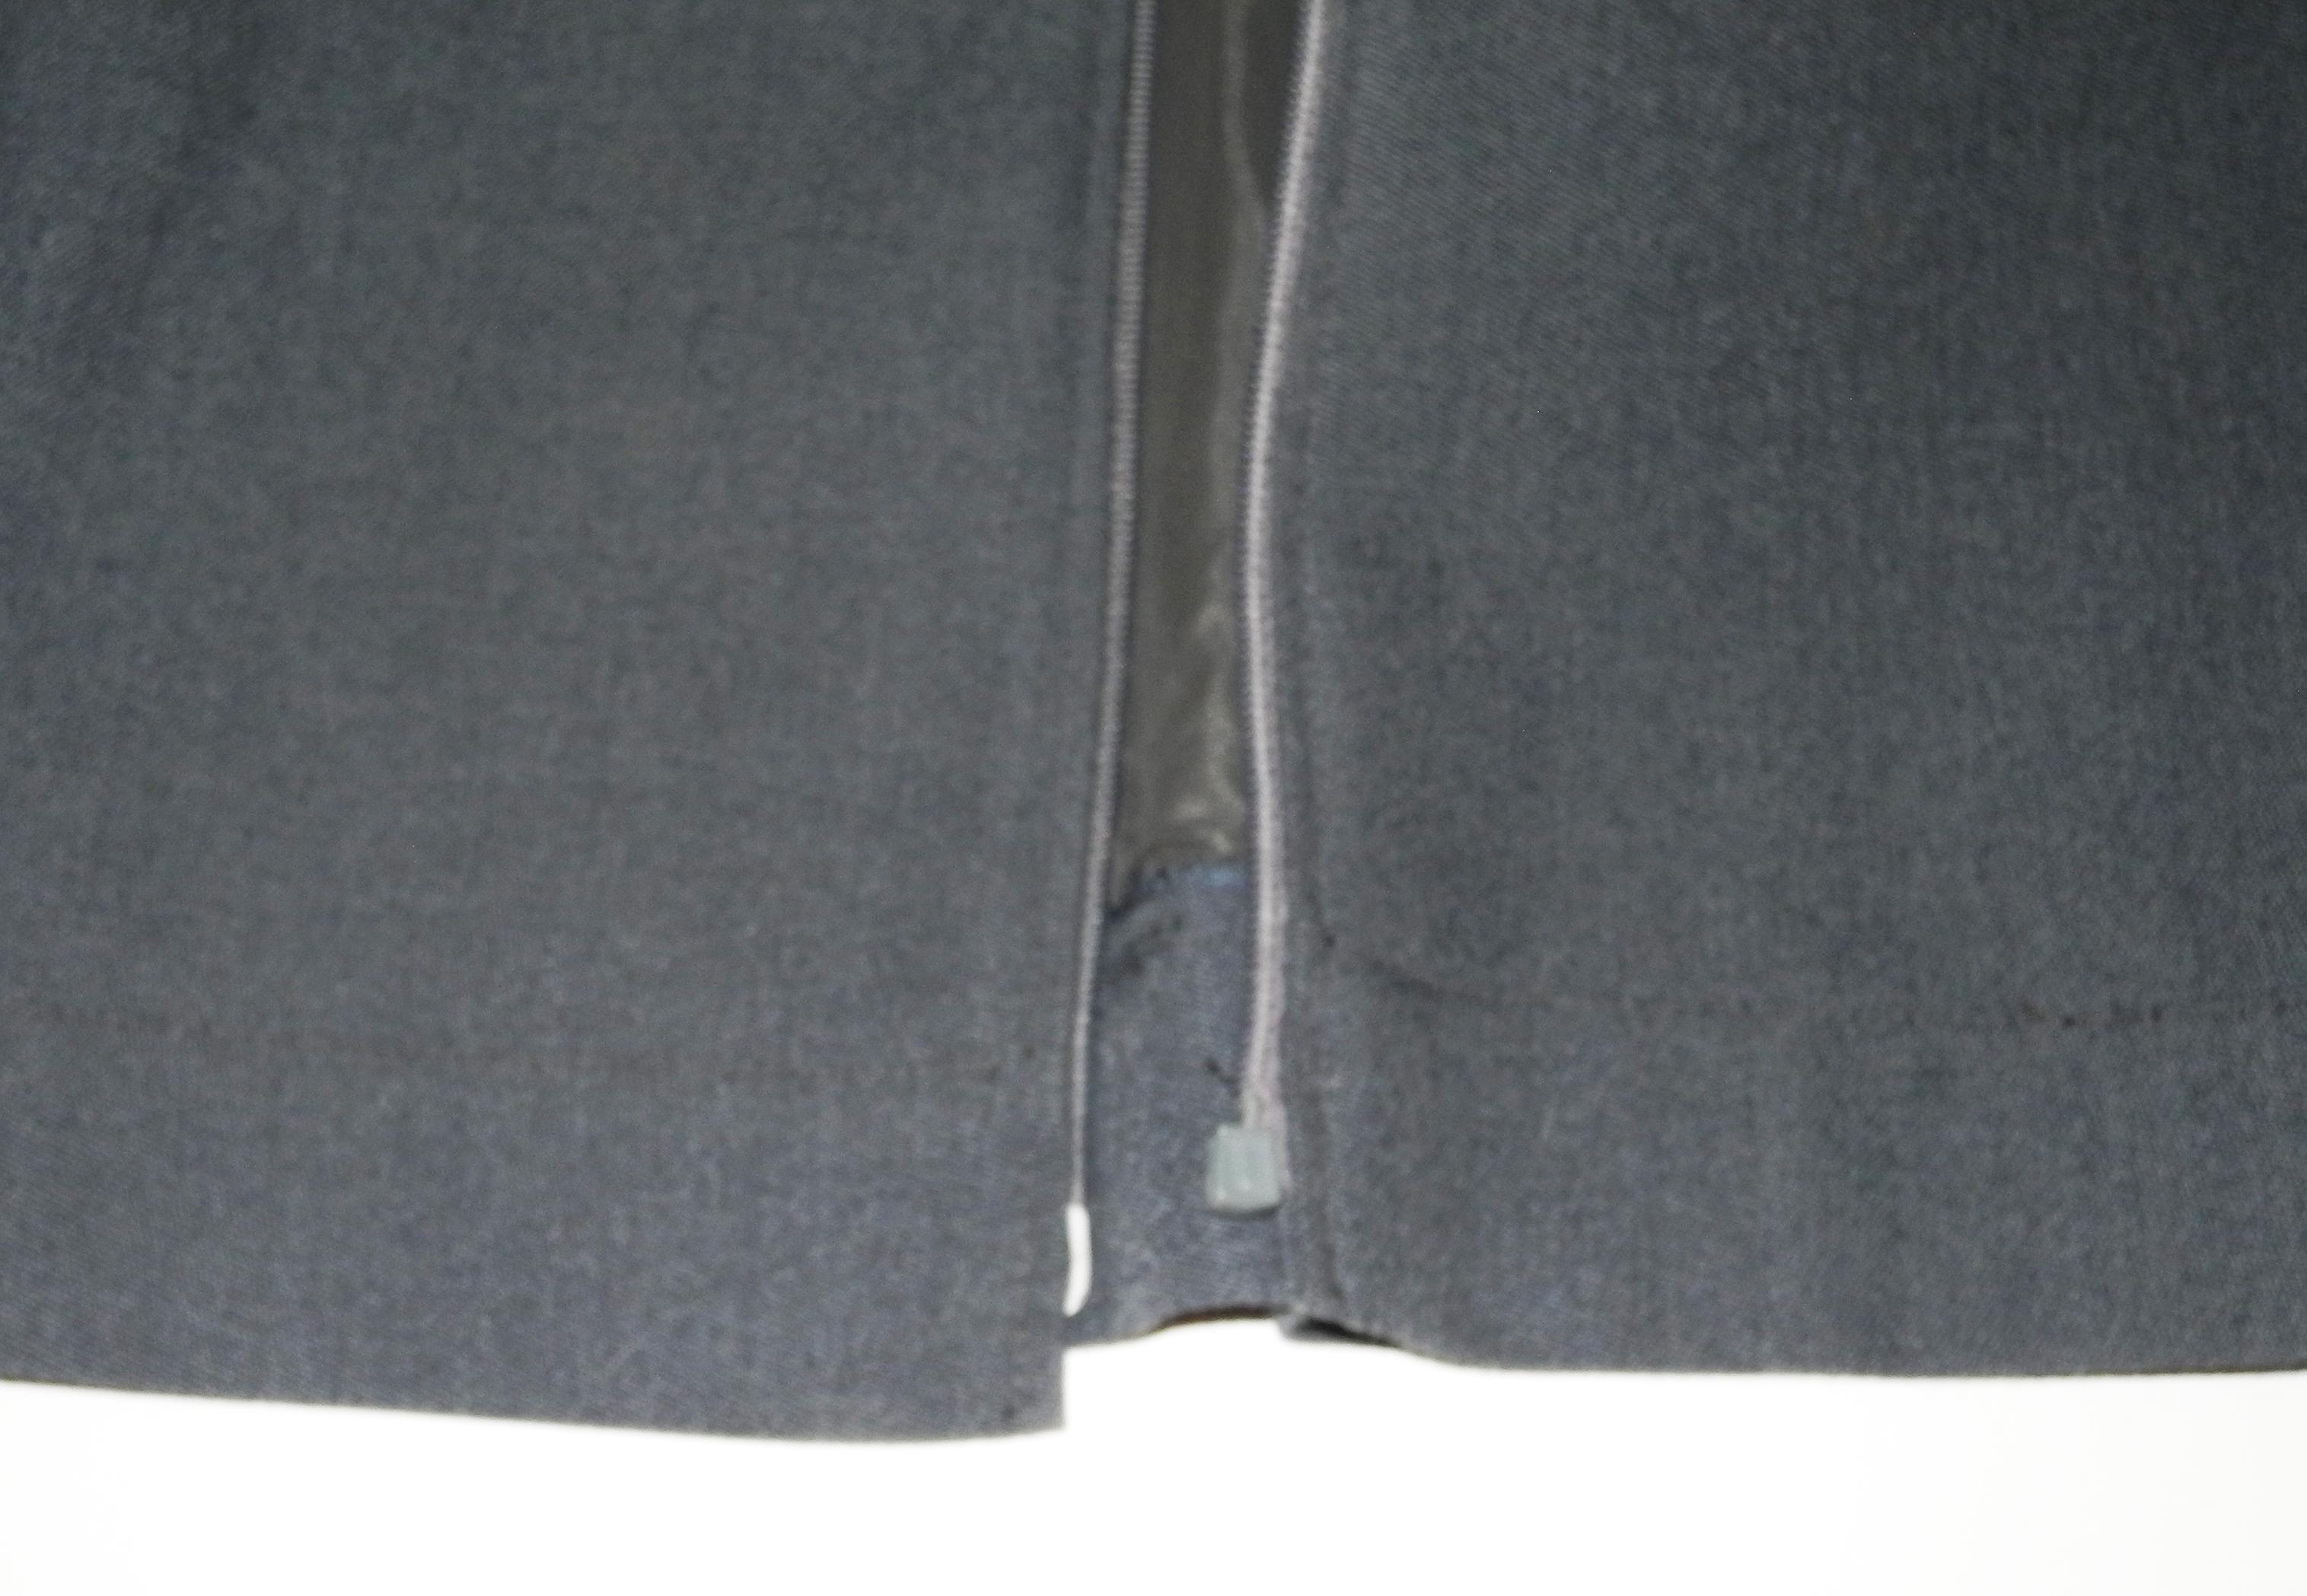 RAF 1972 pattern other ranks short jacket